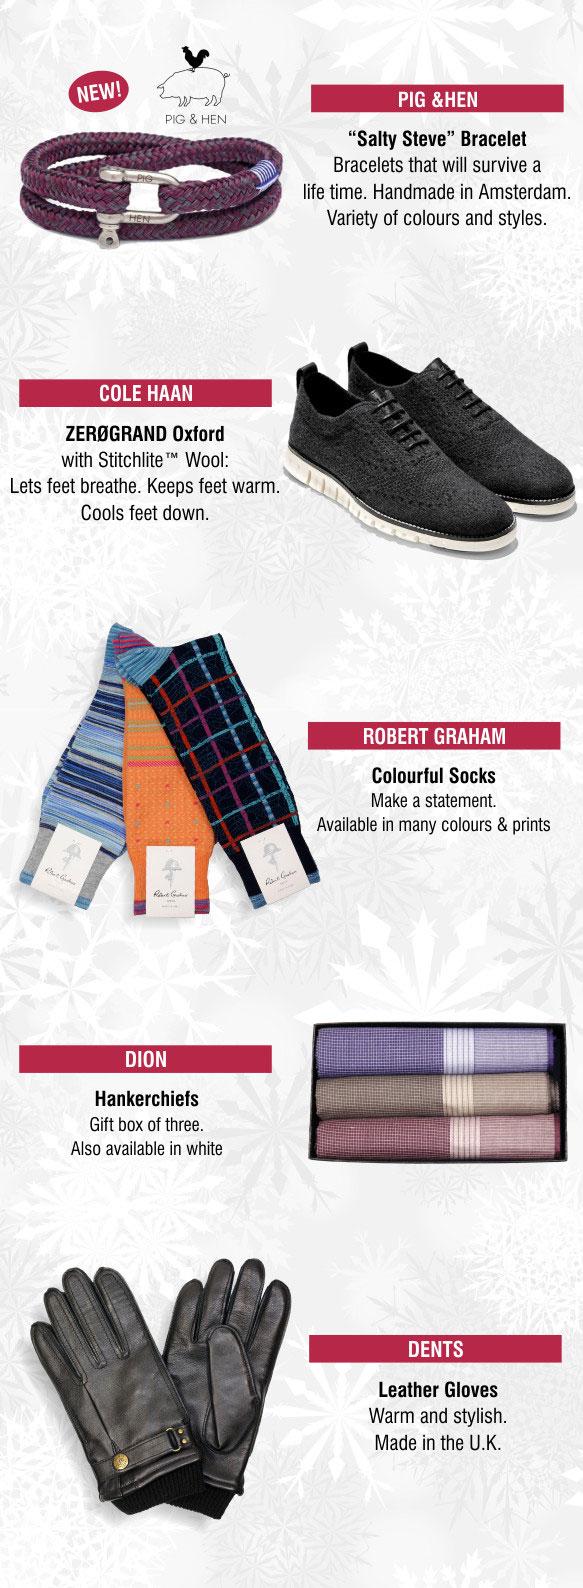 Holiday Gifts: Pig & Hen bracelet, Cole Haan shoes, Robert Graham socks, Dion hankerchiefs, Dents gloves